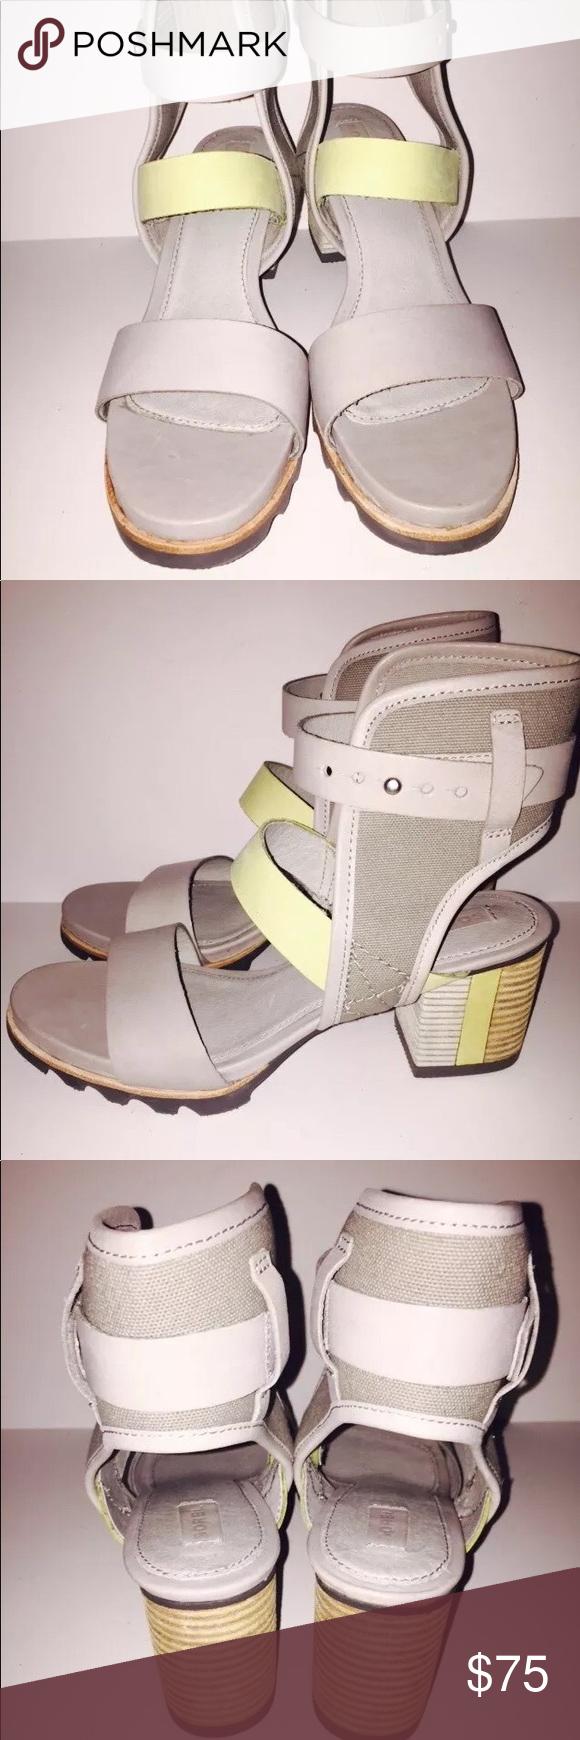 84ac2b81cf5f Sorel Addington Dove Gray Zest Green Sandals Sorel Addington Cuff Sandals  Dove Gray Zest Green